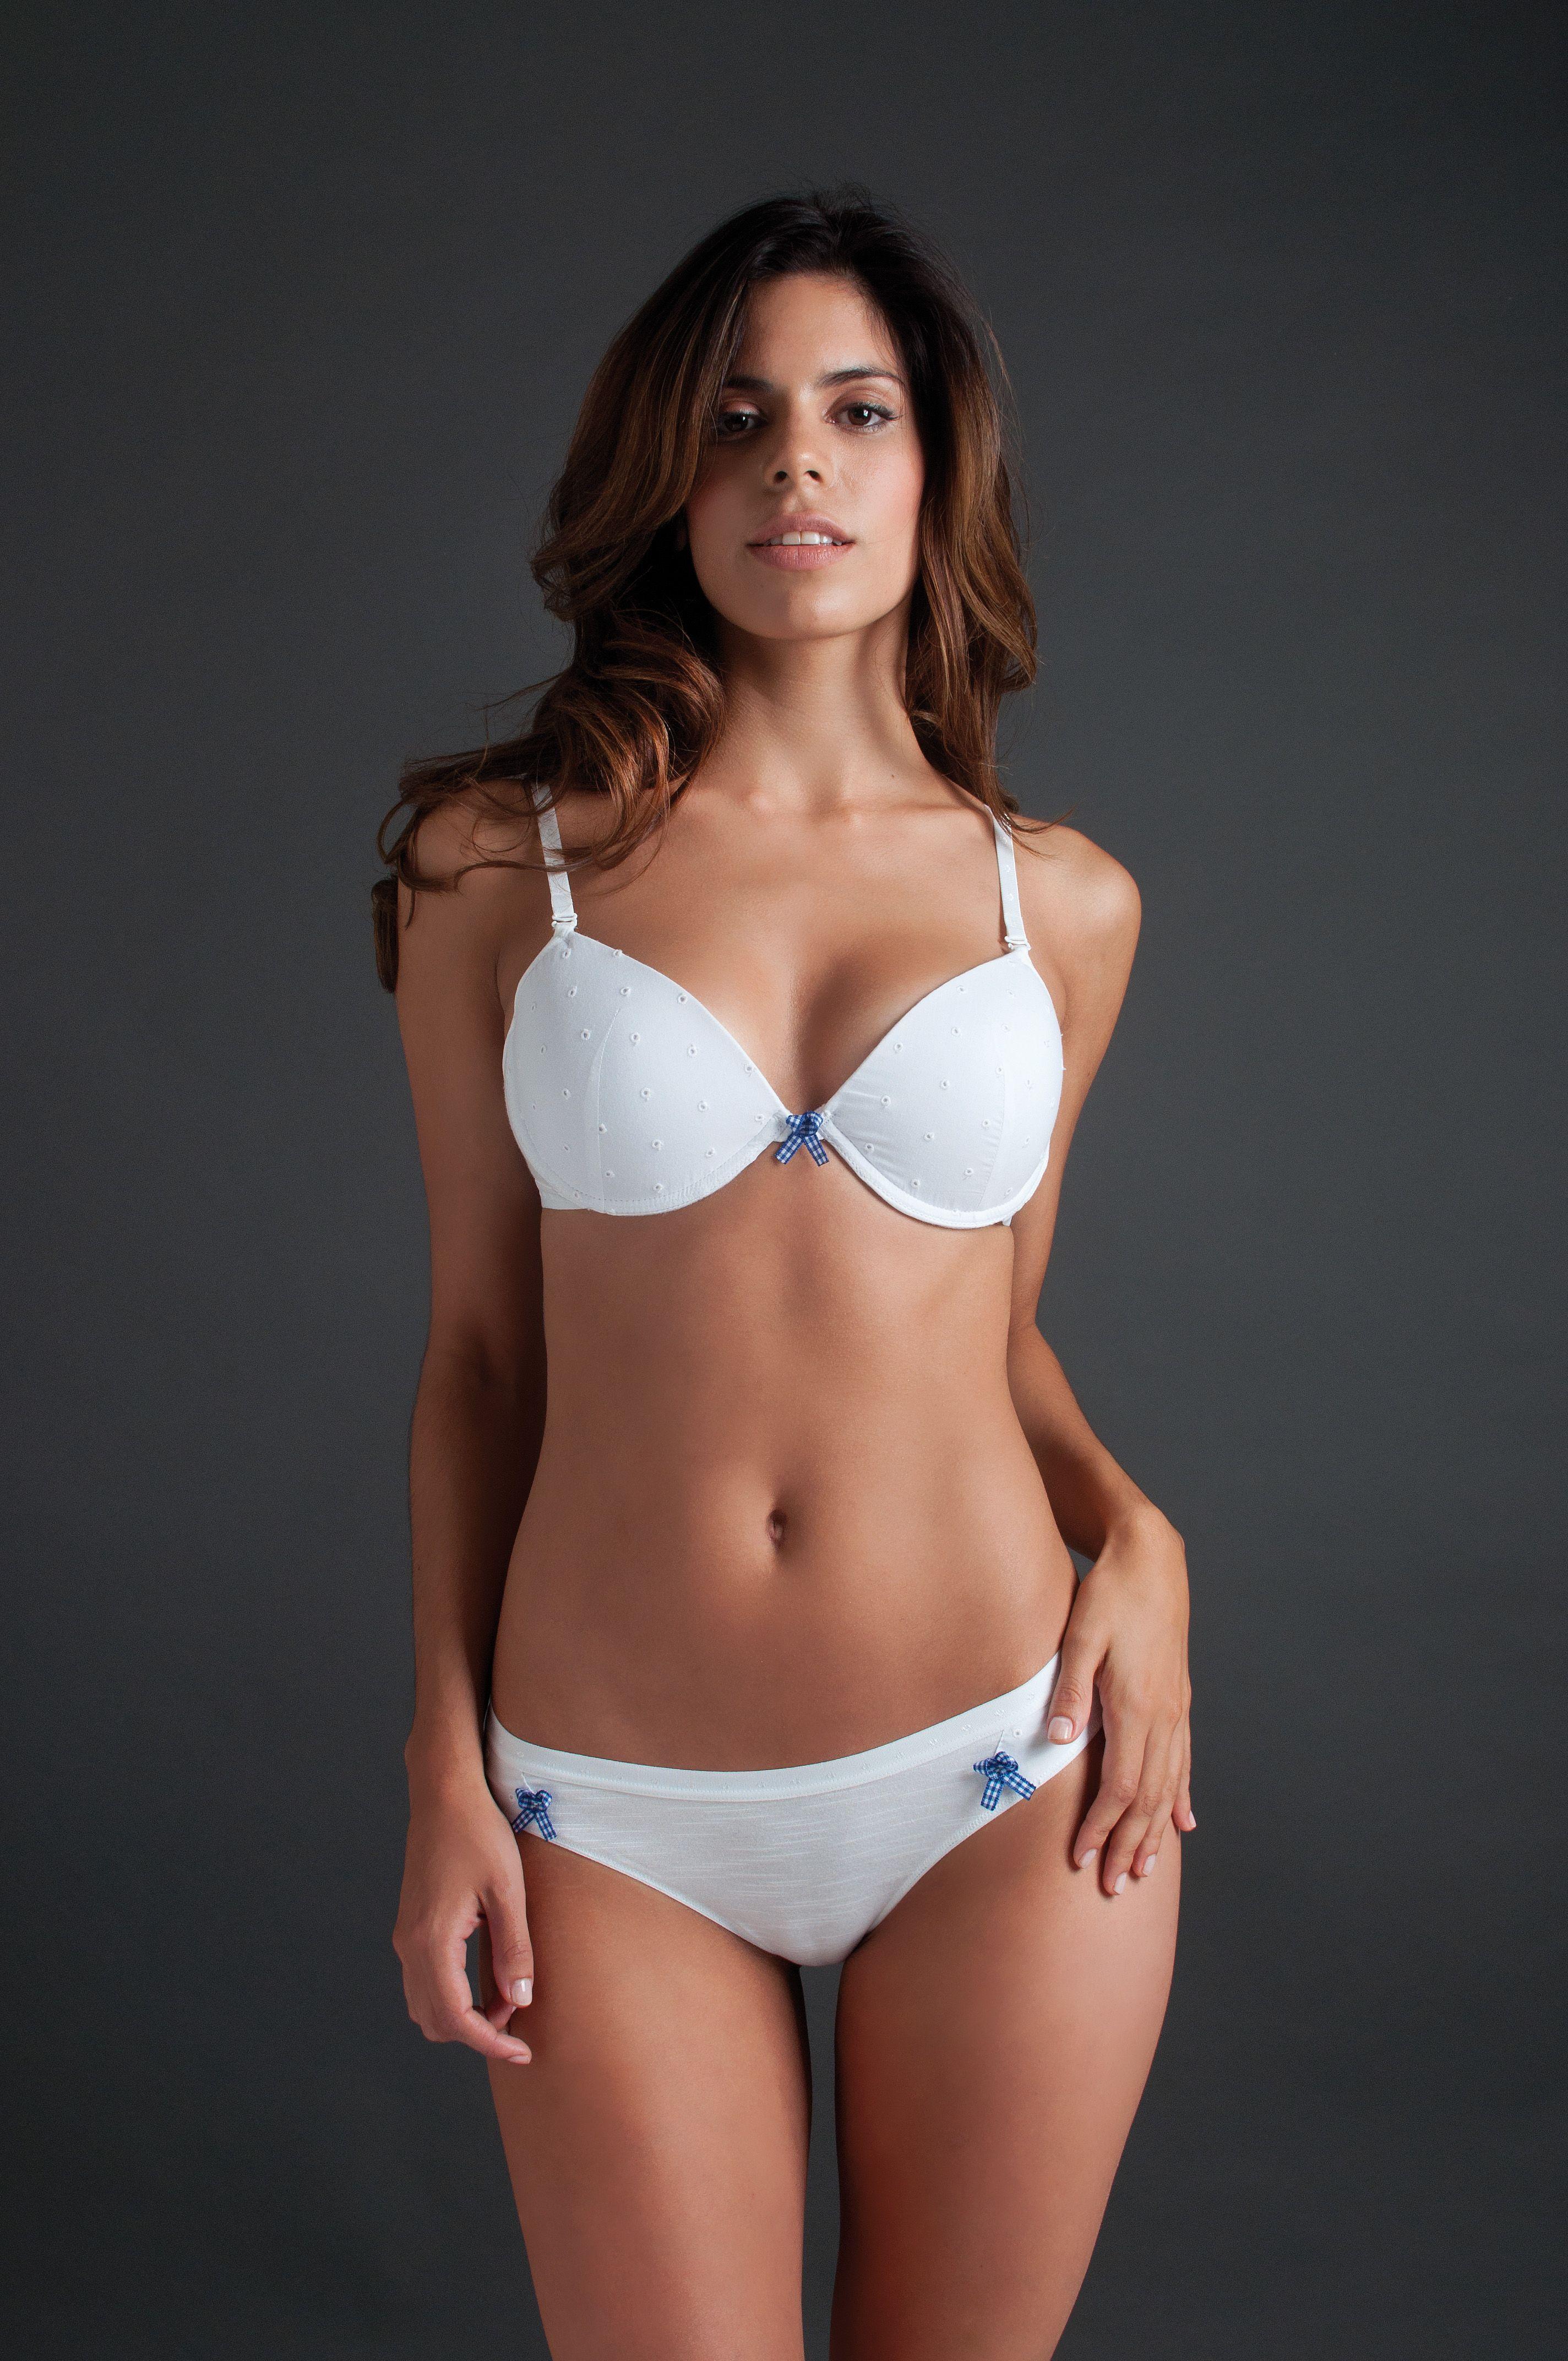 Sexyest naked girls pics